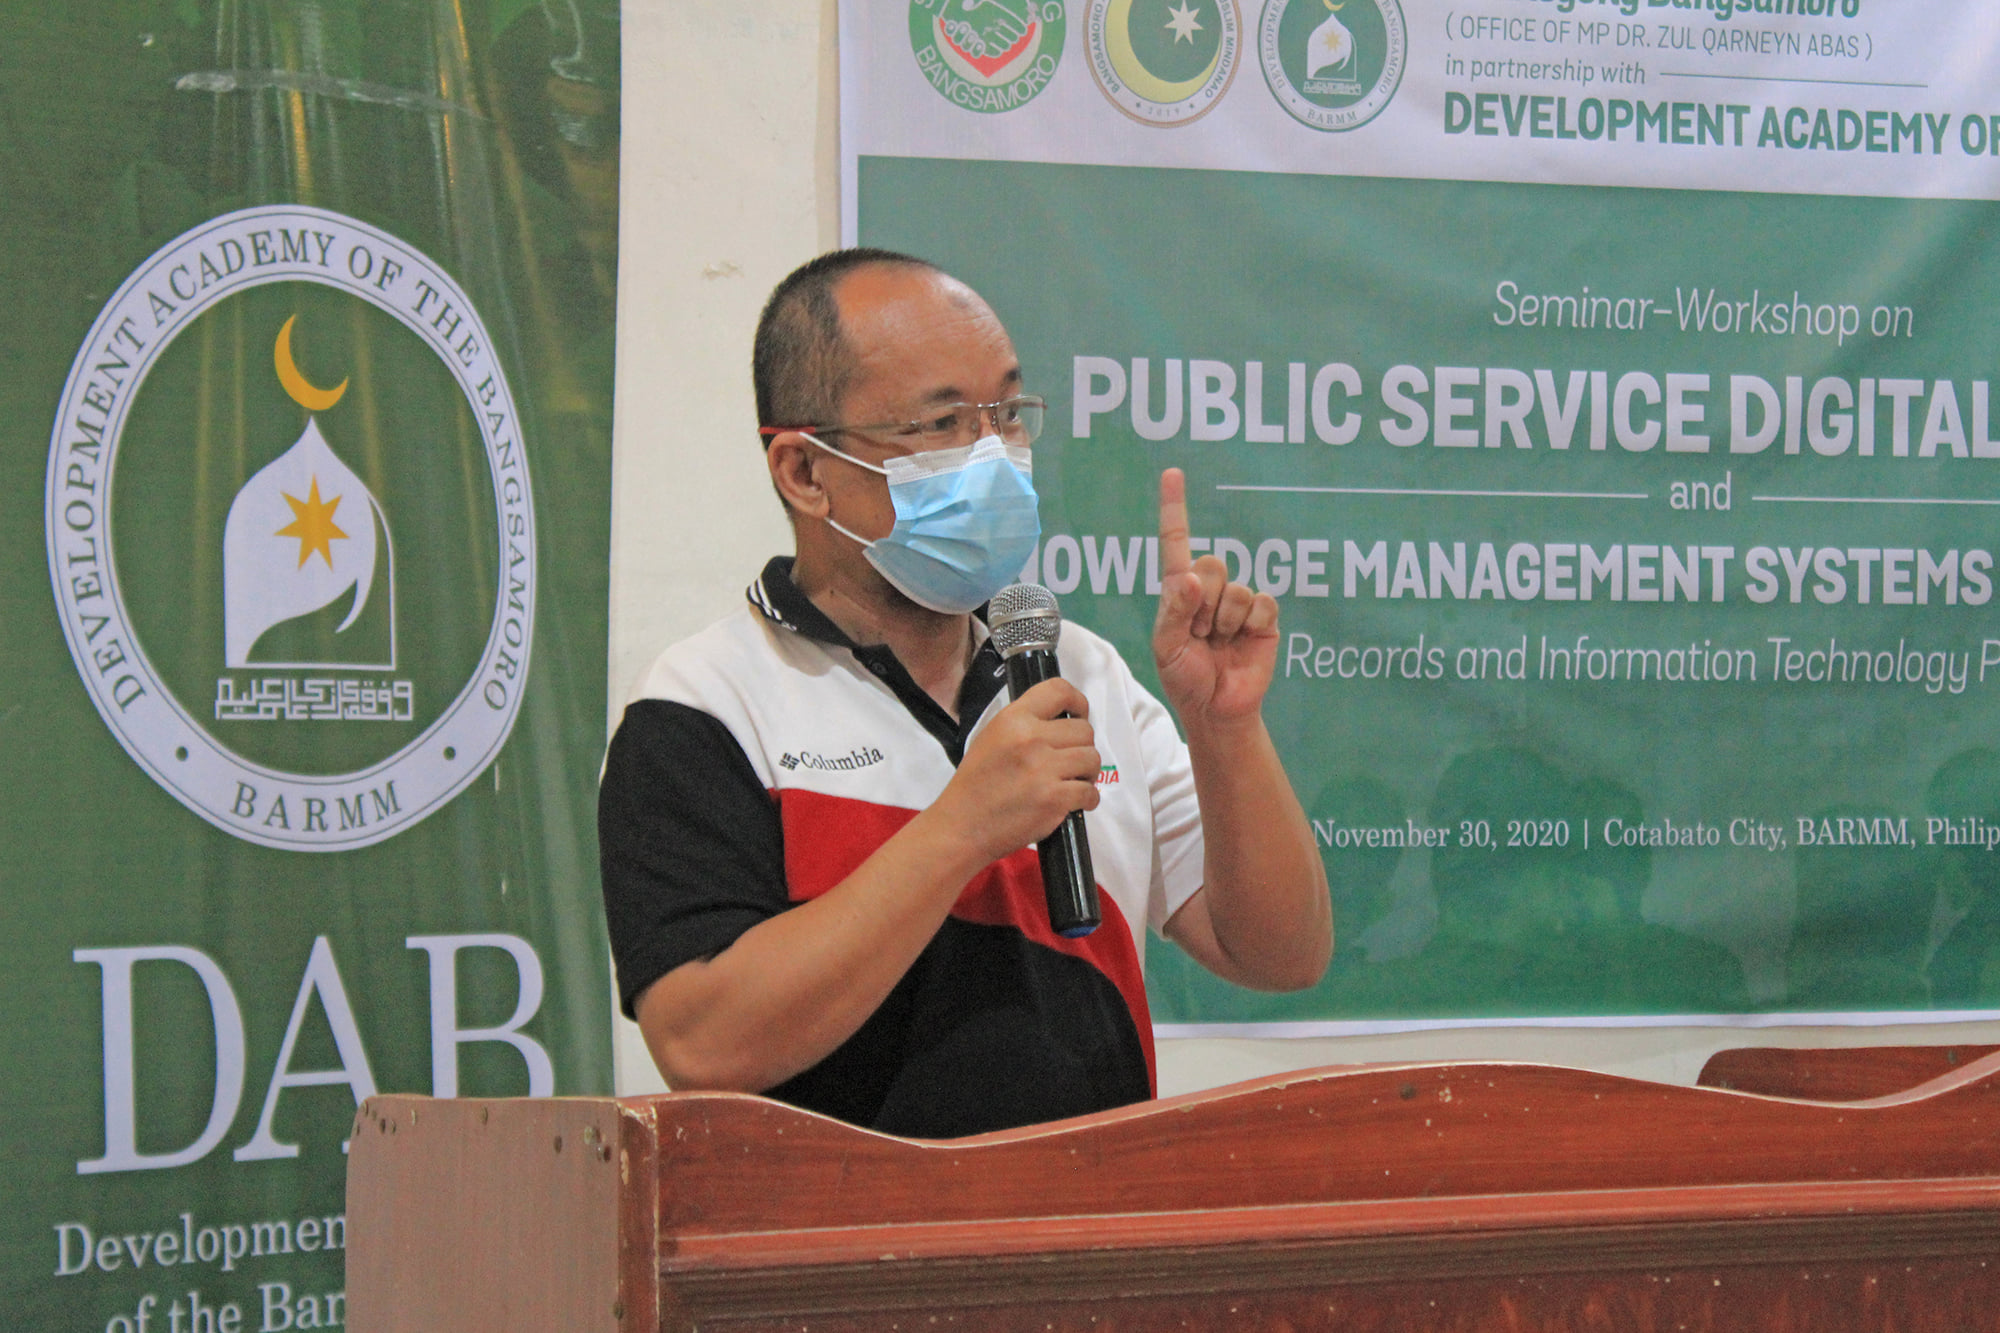 seminar-workshop on Public Service Digitalization